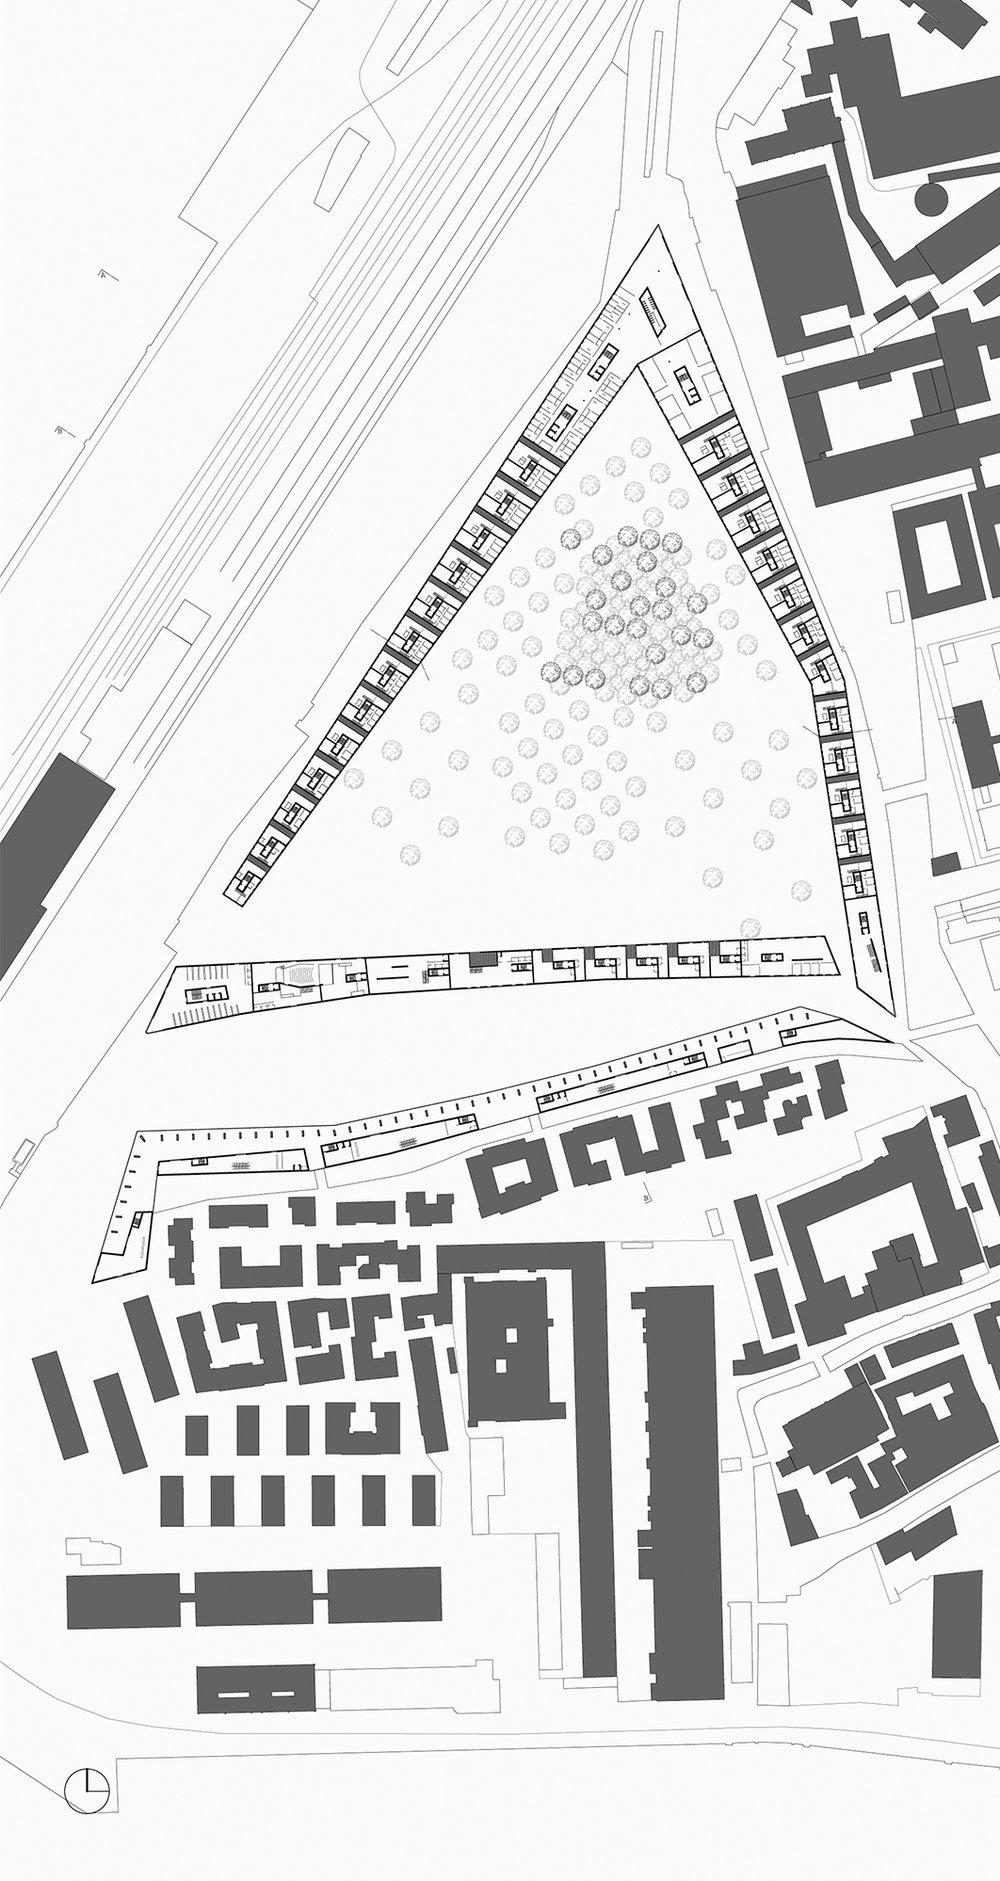 Architektur_offizin-a_Projekte_Kultur_Venedig_ExPiazzaDArmi_10.jpg